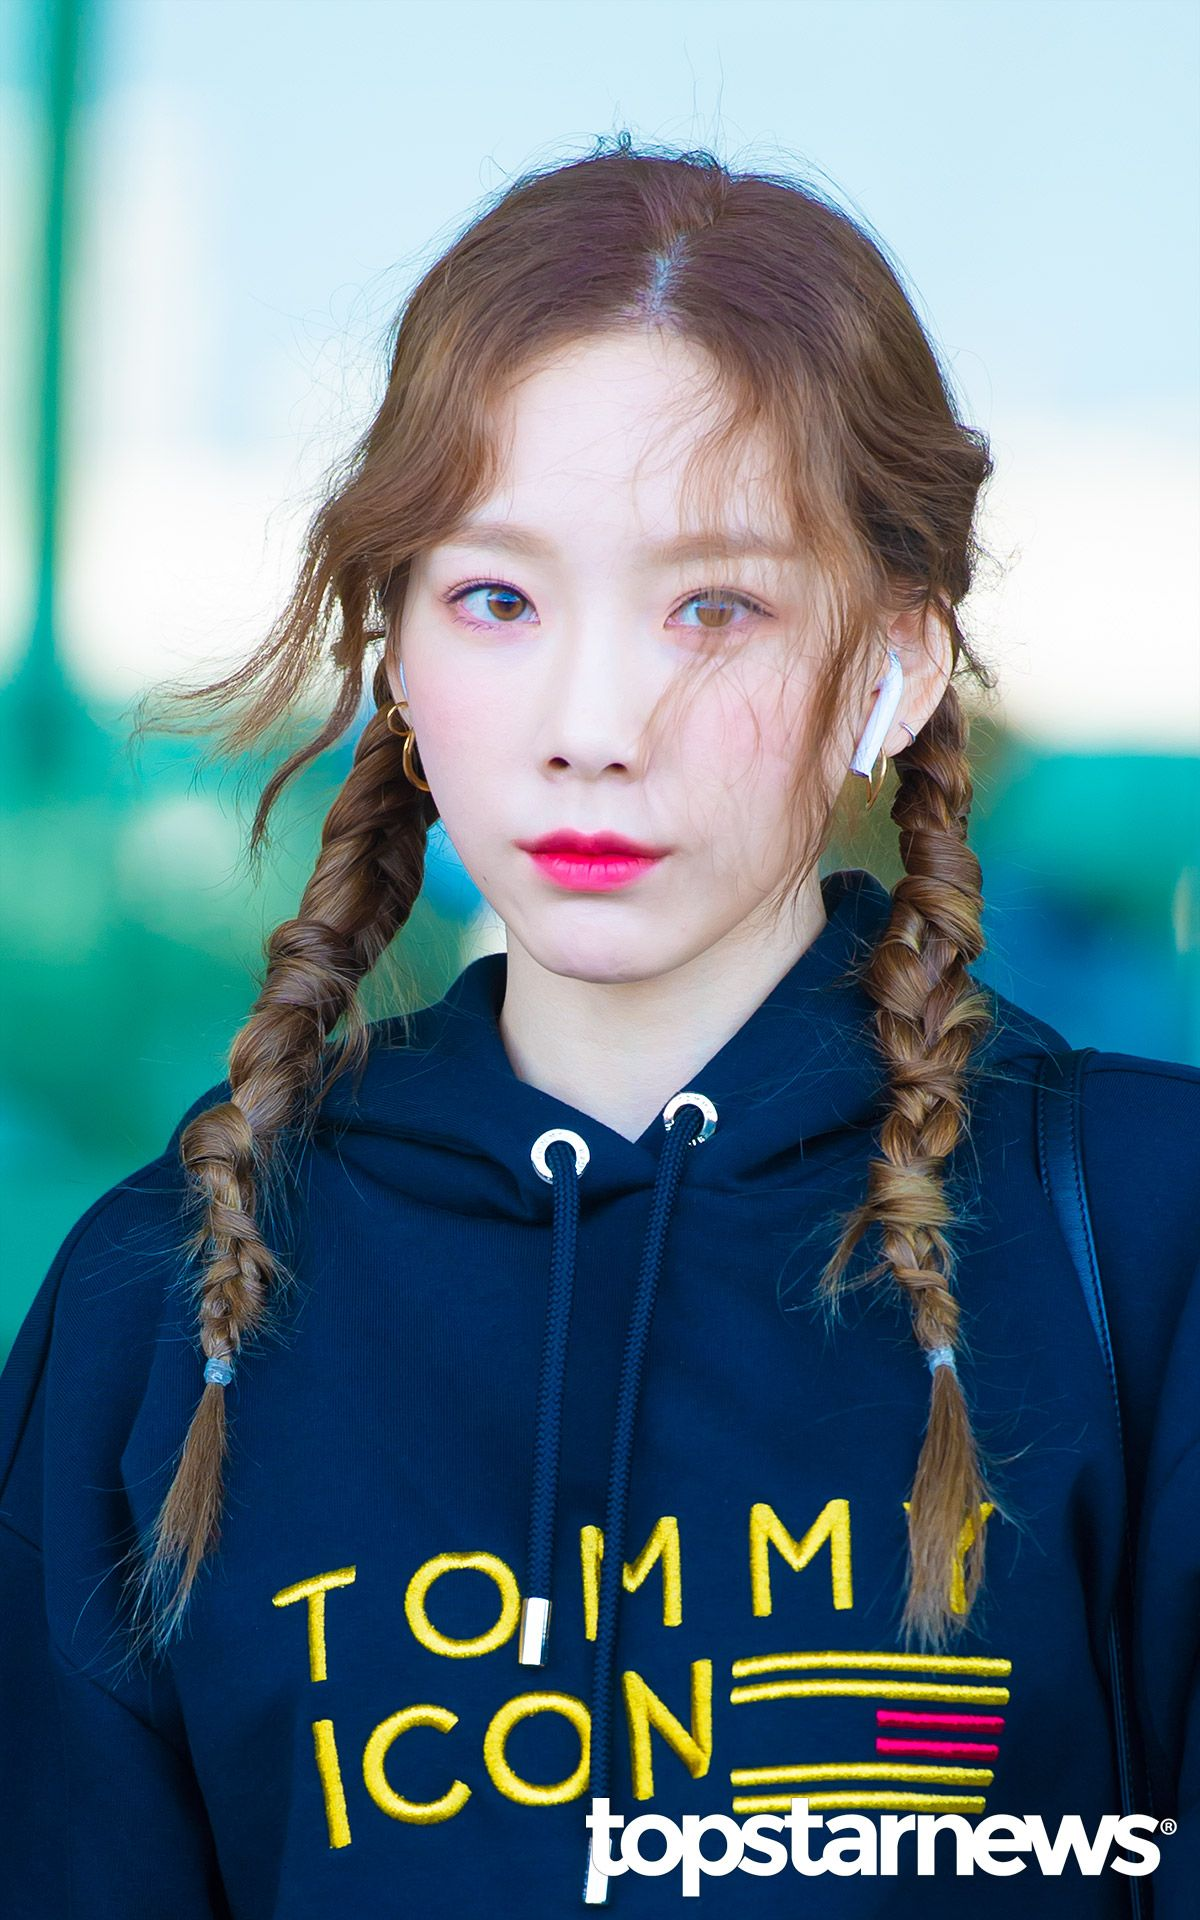 180904 Kim Taeyeon 3 Girls Generation Generation